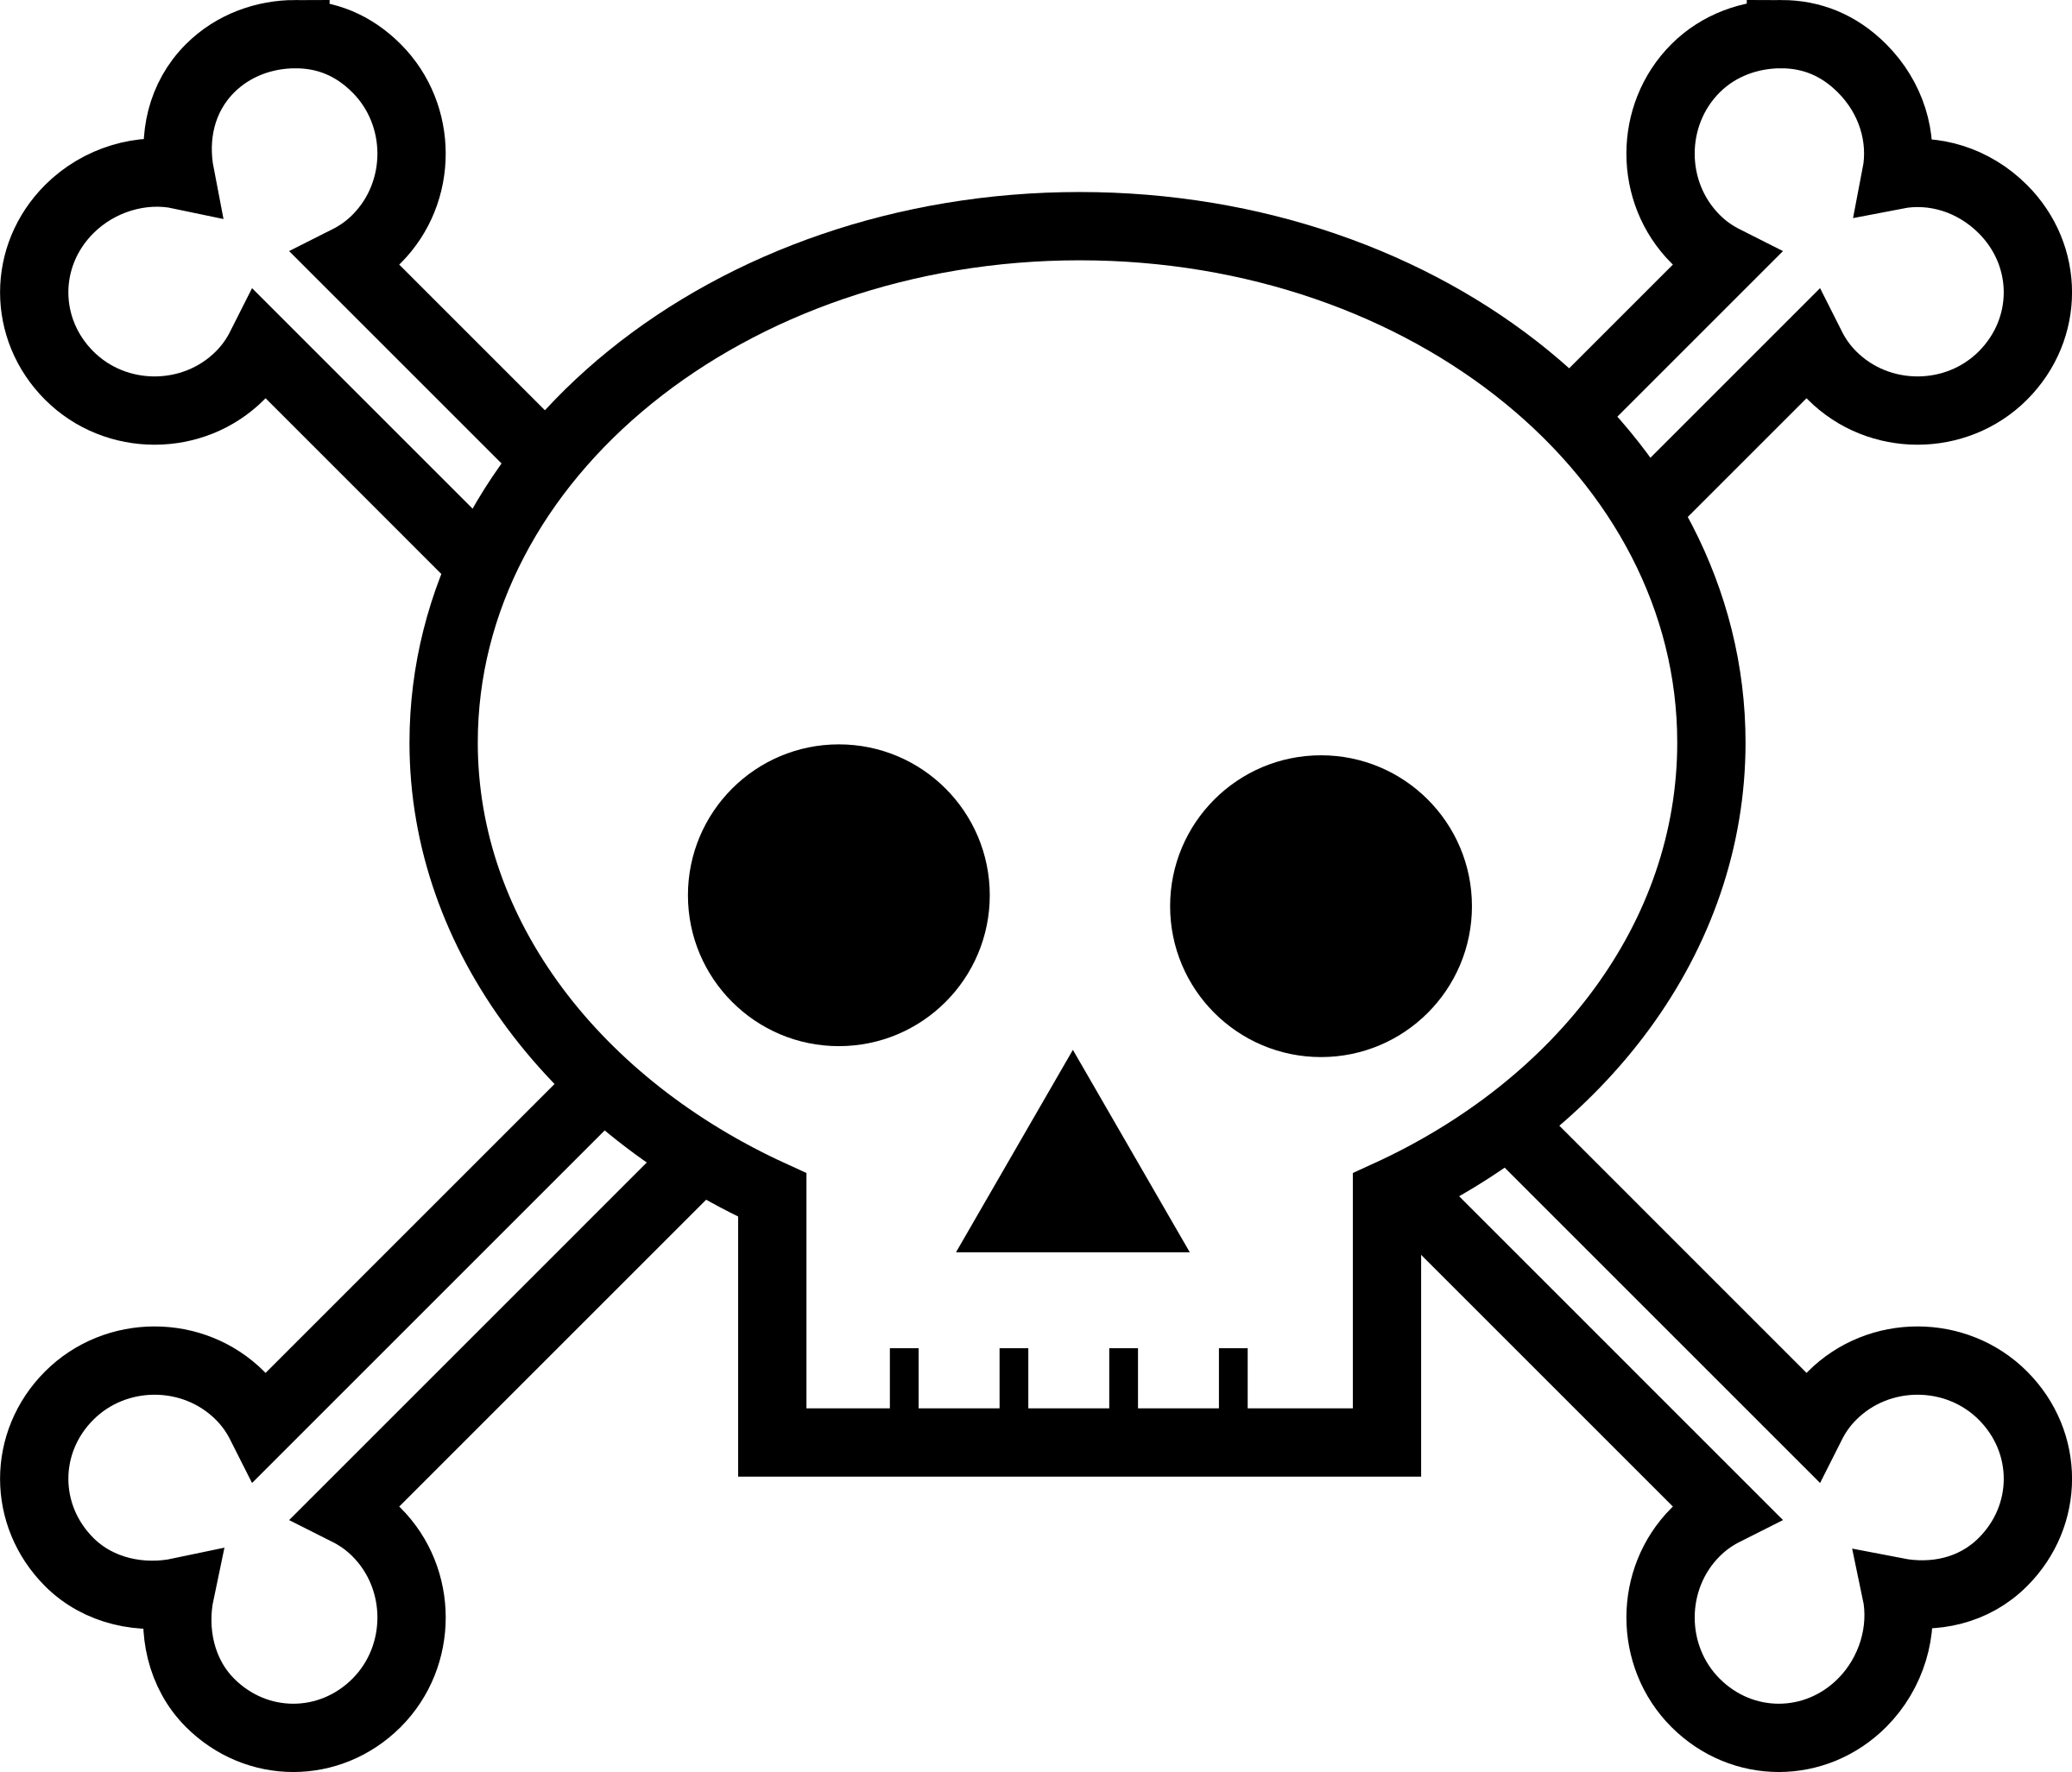 clip freeuse download Skull and big image. Crossbones clipart